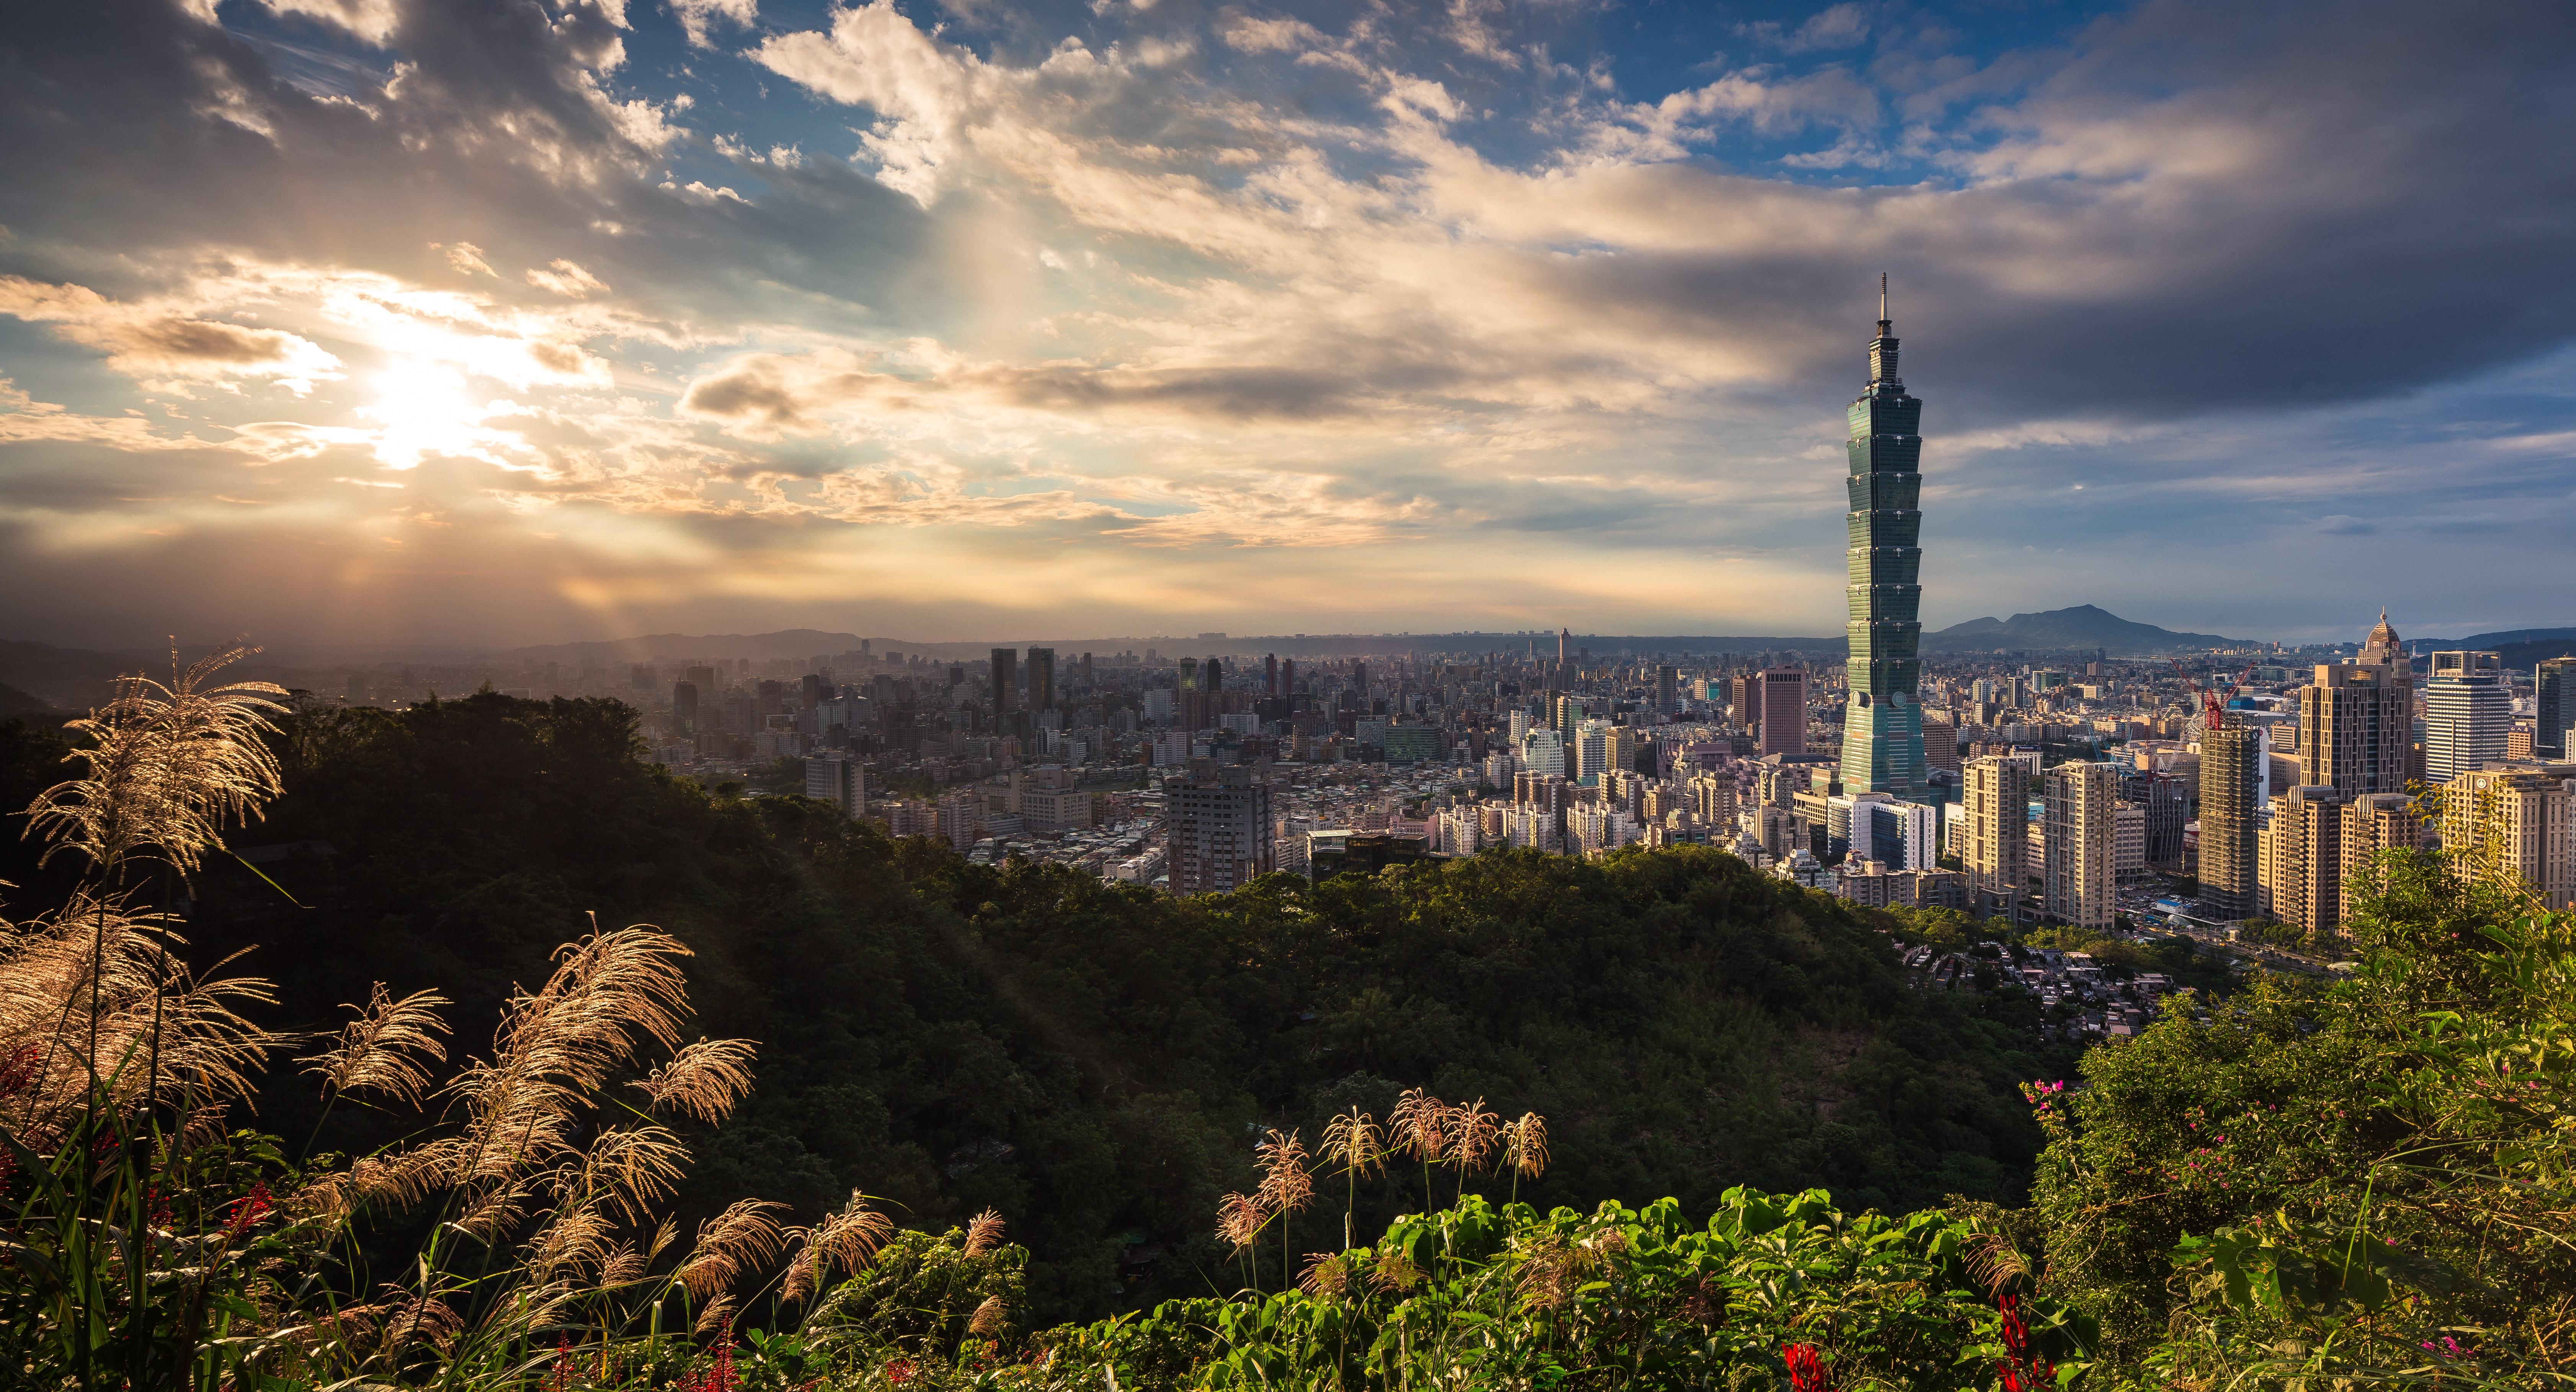 Sunset over Taipei City